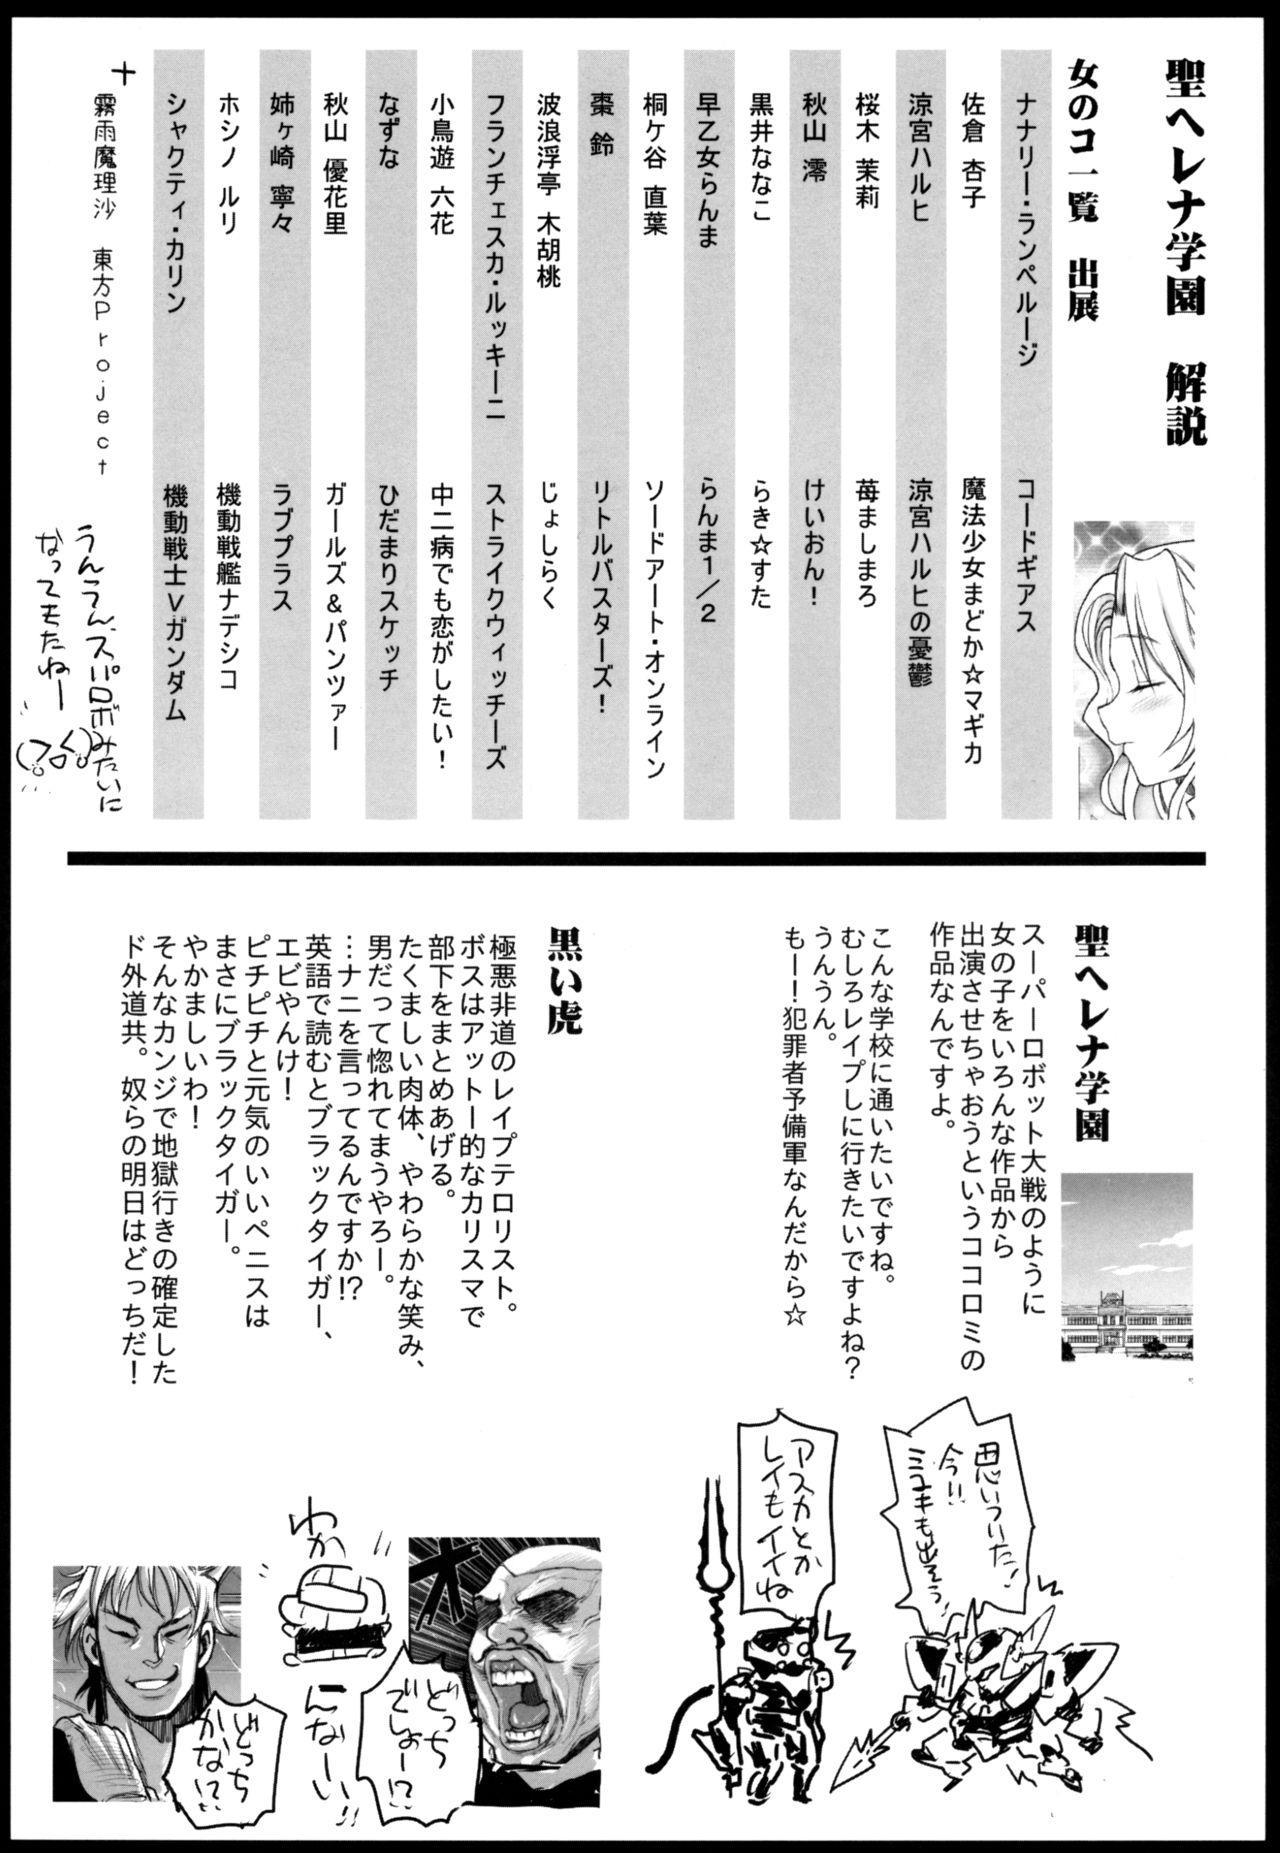 [Eromazun (Ma-Kurou)] Saint Helena Gakuen 2 ~ Terrorist ni Senkyosareta Jogakuen de Rape Matsuri!~   Saint Helena Academy 2 ~A School Occupied by Terrorists Becomes a Rape Festival!~ (Various) [English] [B.E.C. Scans] 43